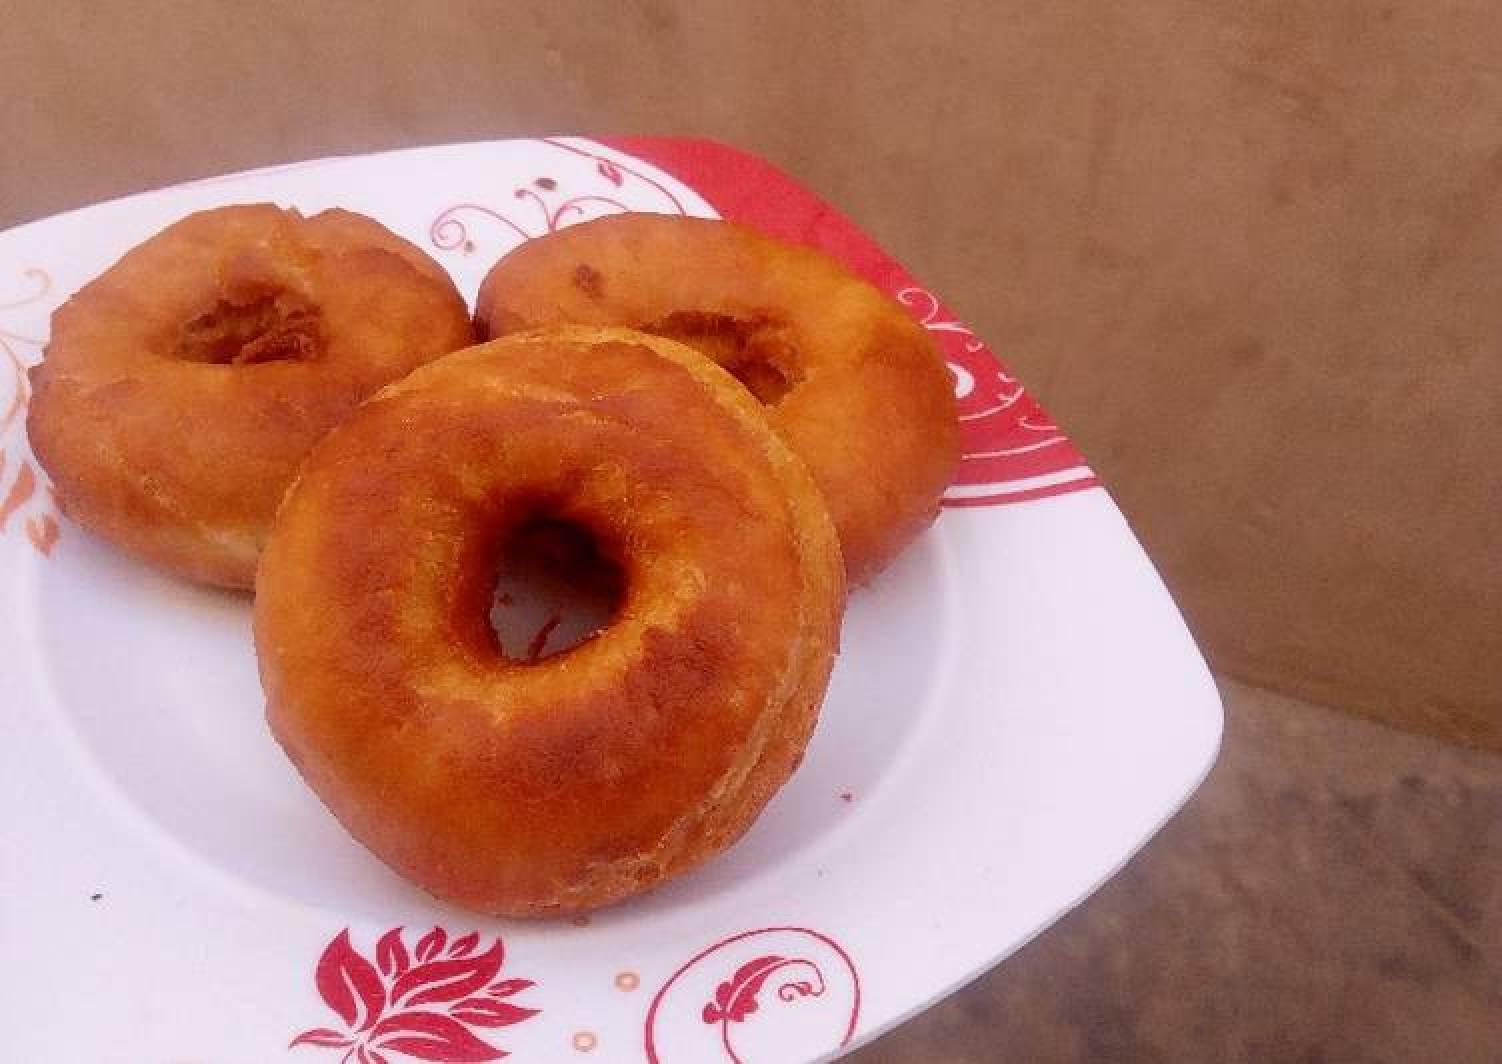 Fluffy doughnut